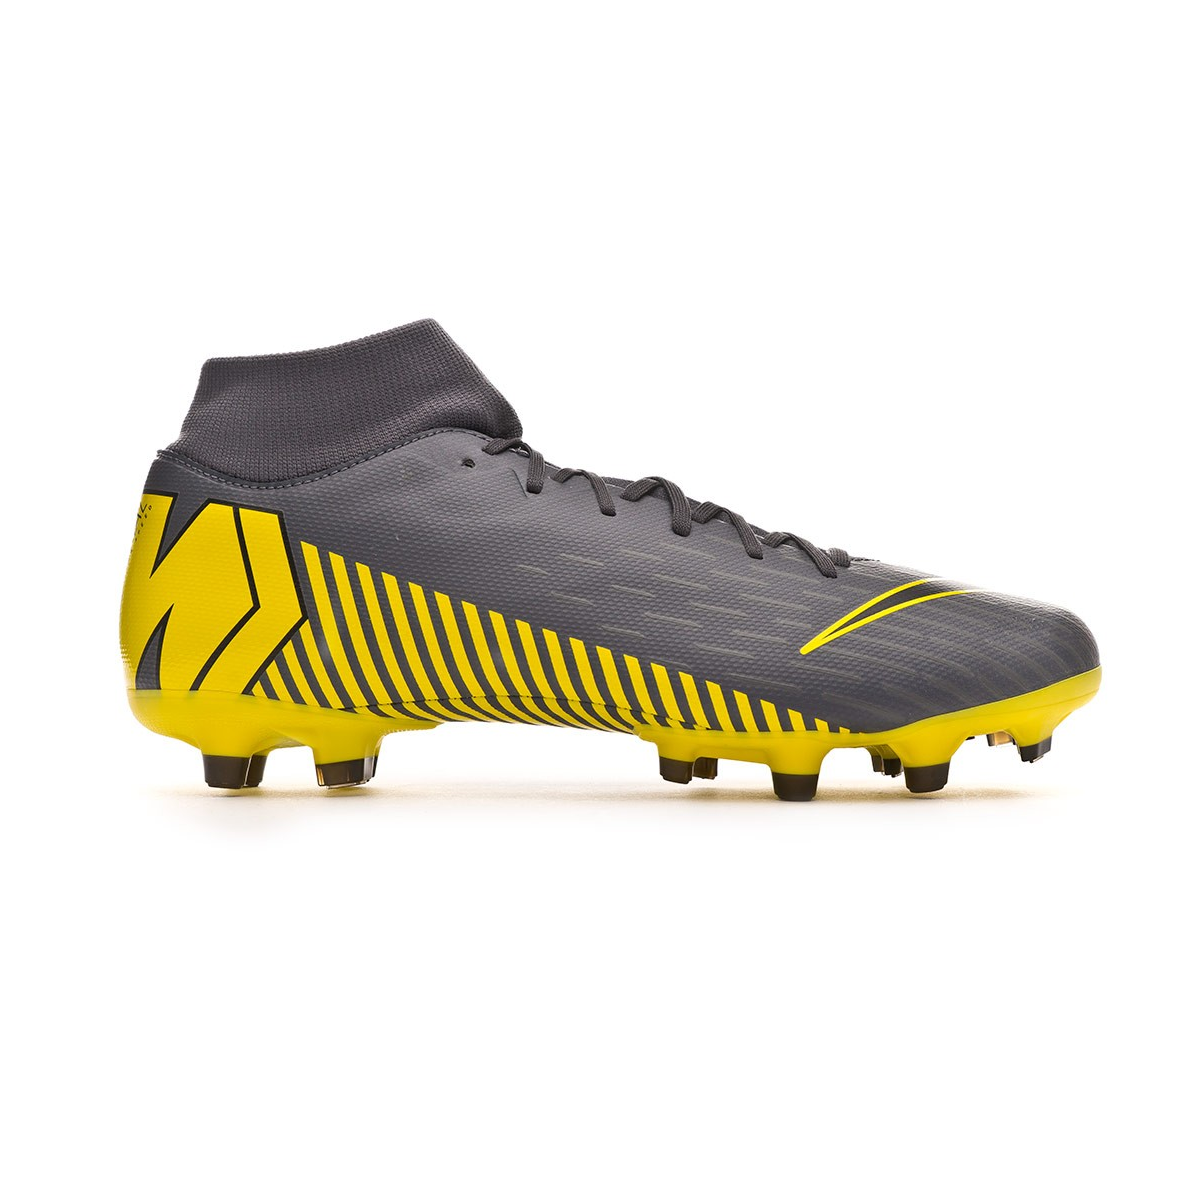 Fútbol 6 Mg Nike Man Botas Mercurial Gris Academy Superfly m8w0Nn